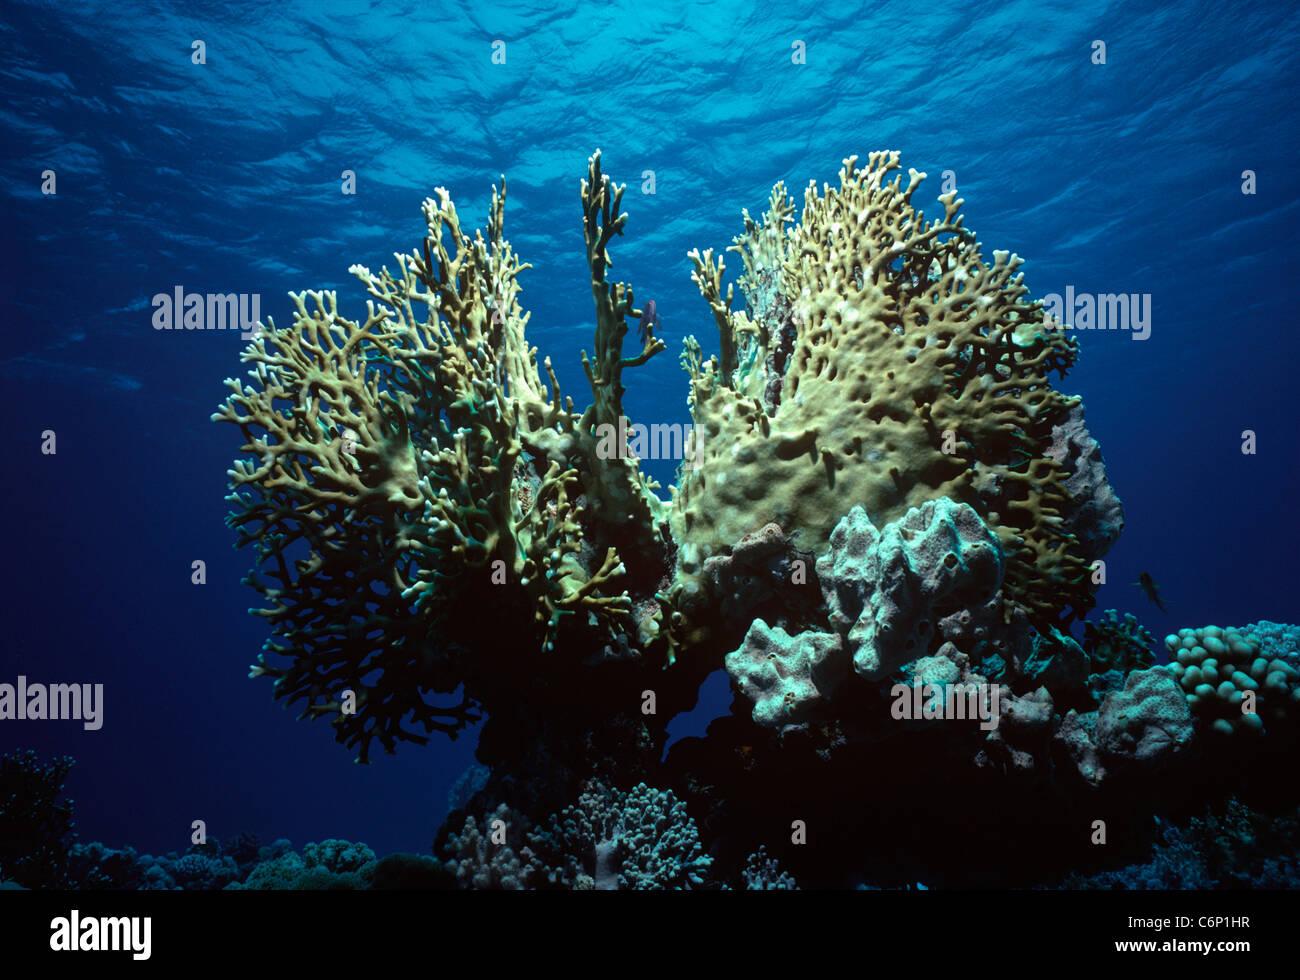 Fire Coral (Millepora tenella). Caribbean Sea, Bahamas - Stock Image